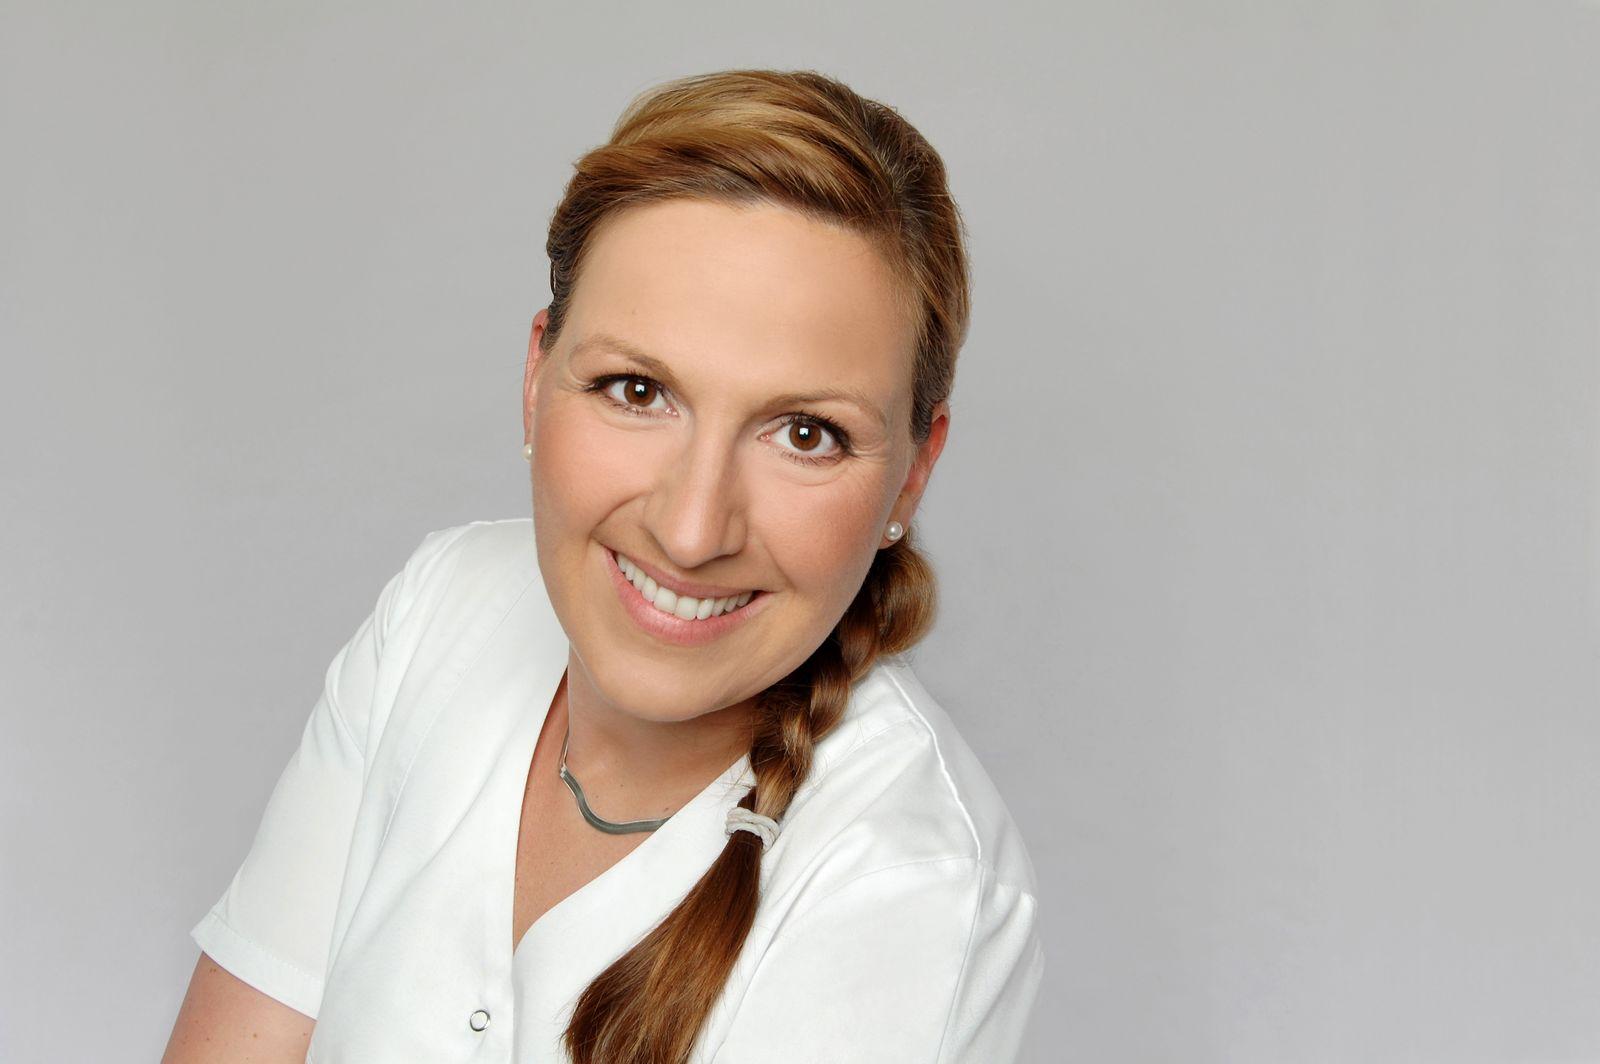 Zahnarztpraxis Kristin Börner, Novalisstraße 10 in Berlin